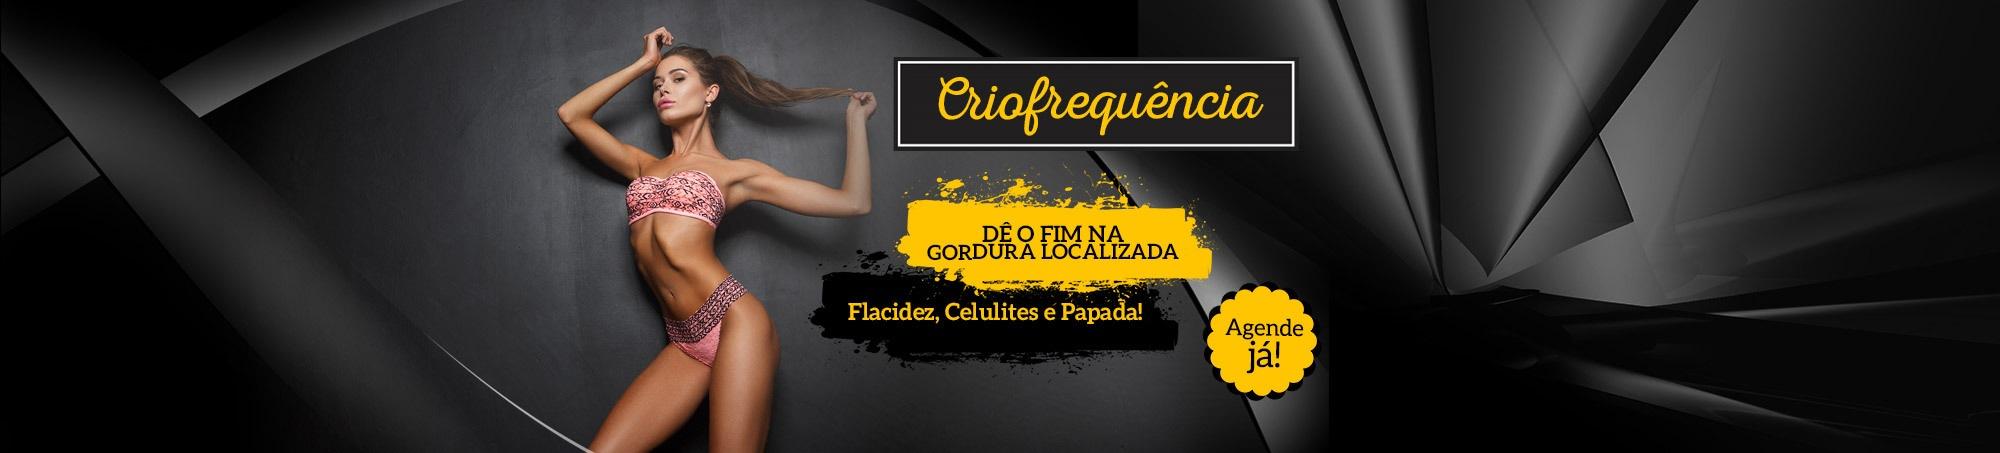 banner-fisest-2000x453-criofrequencia-1